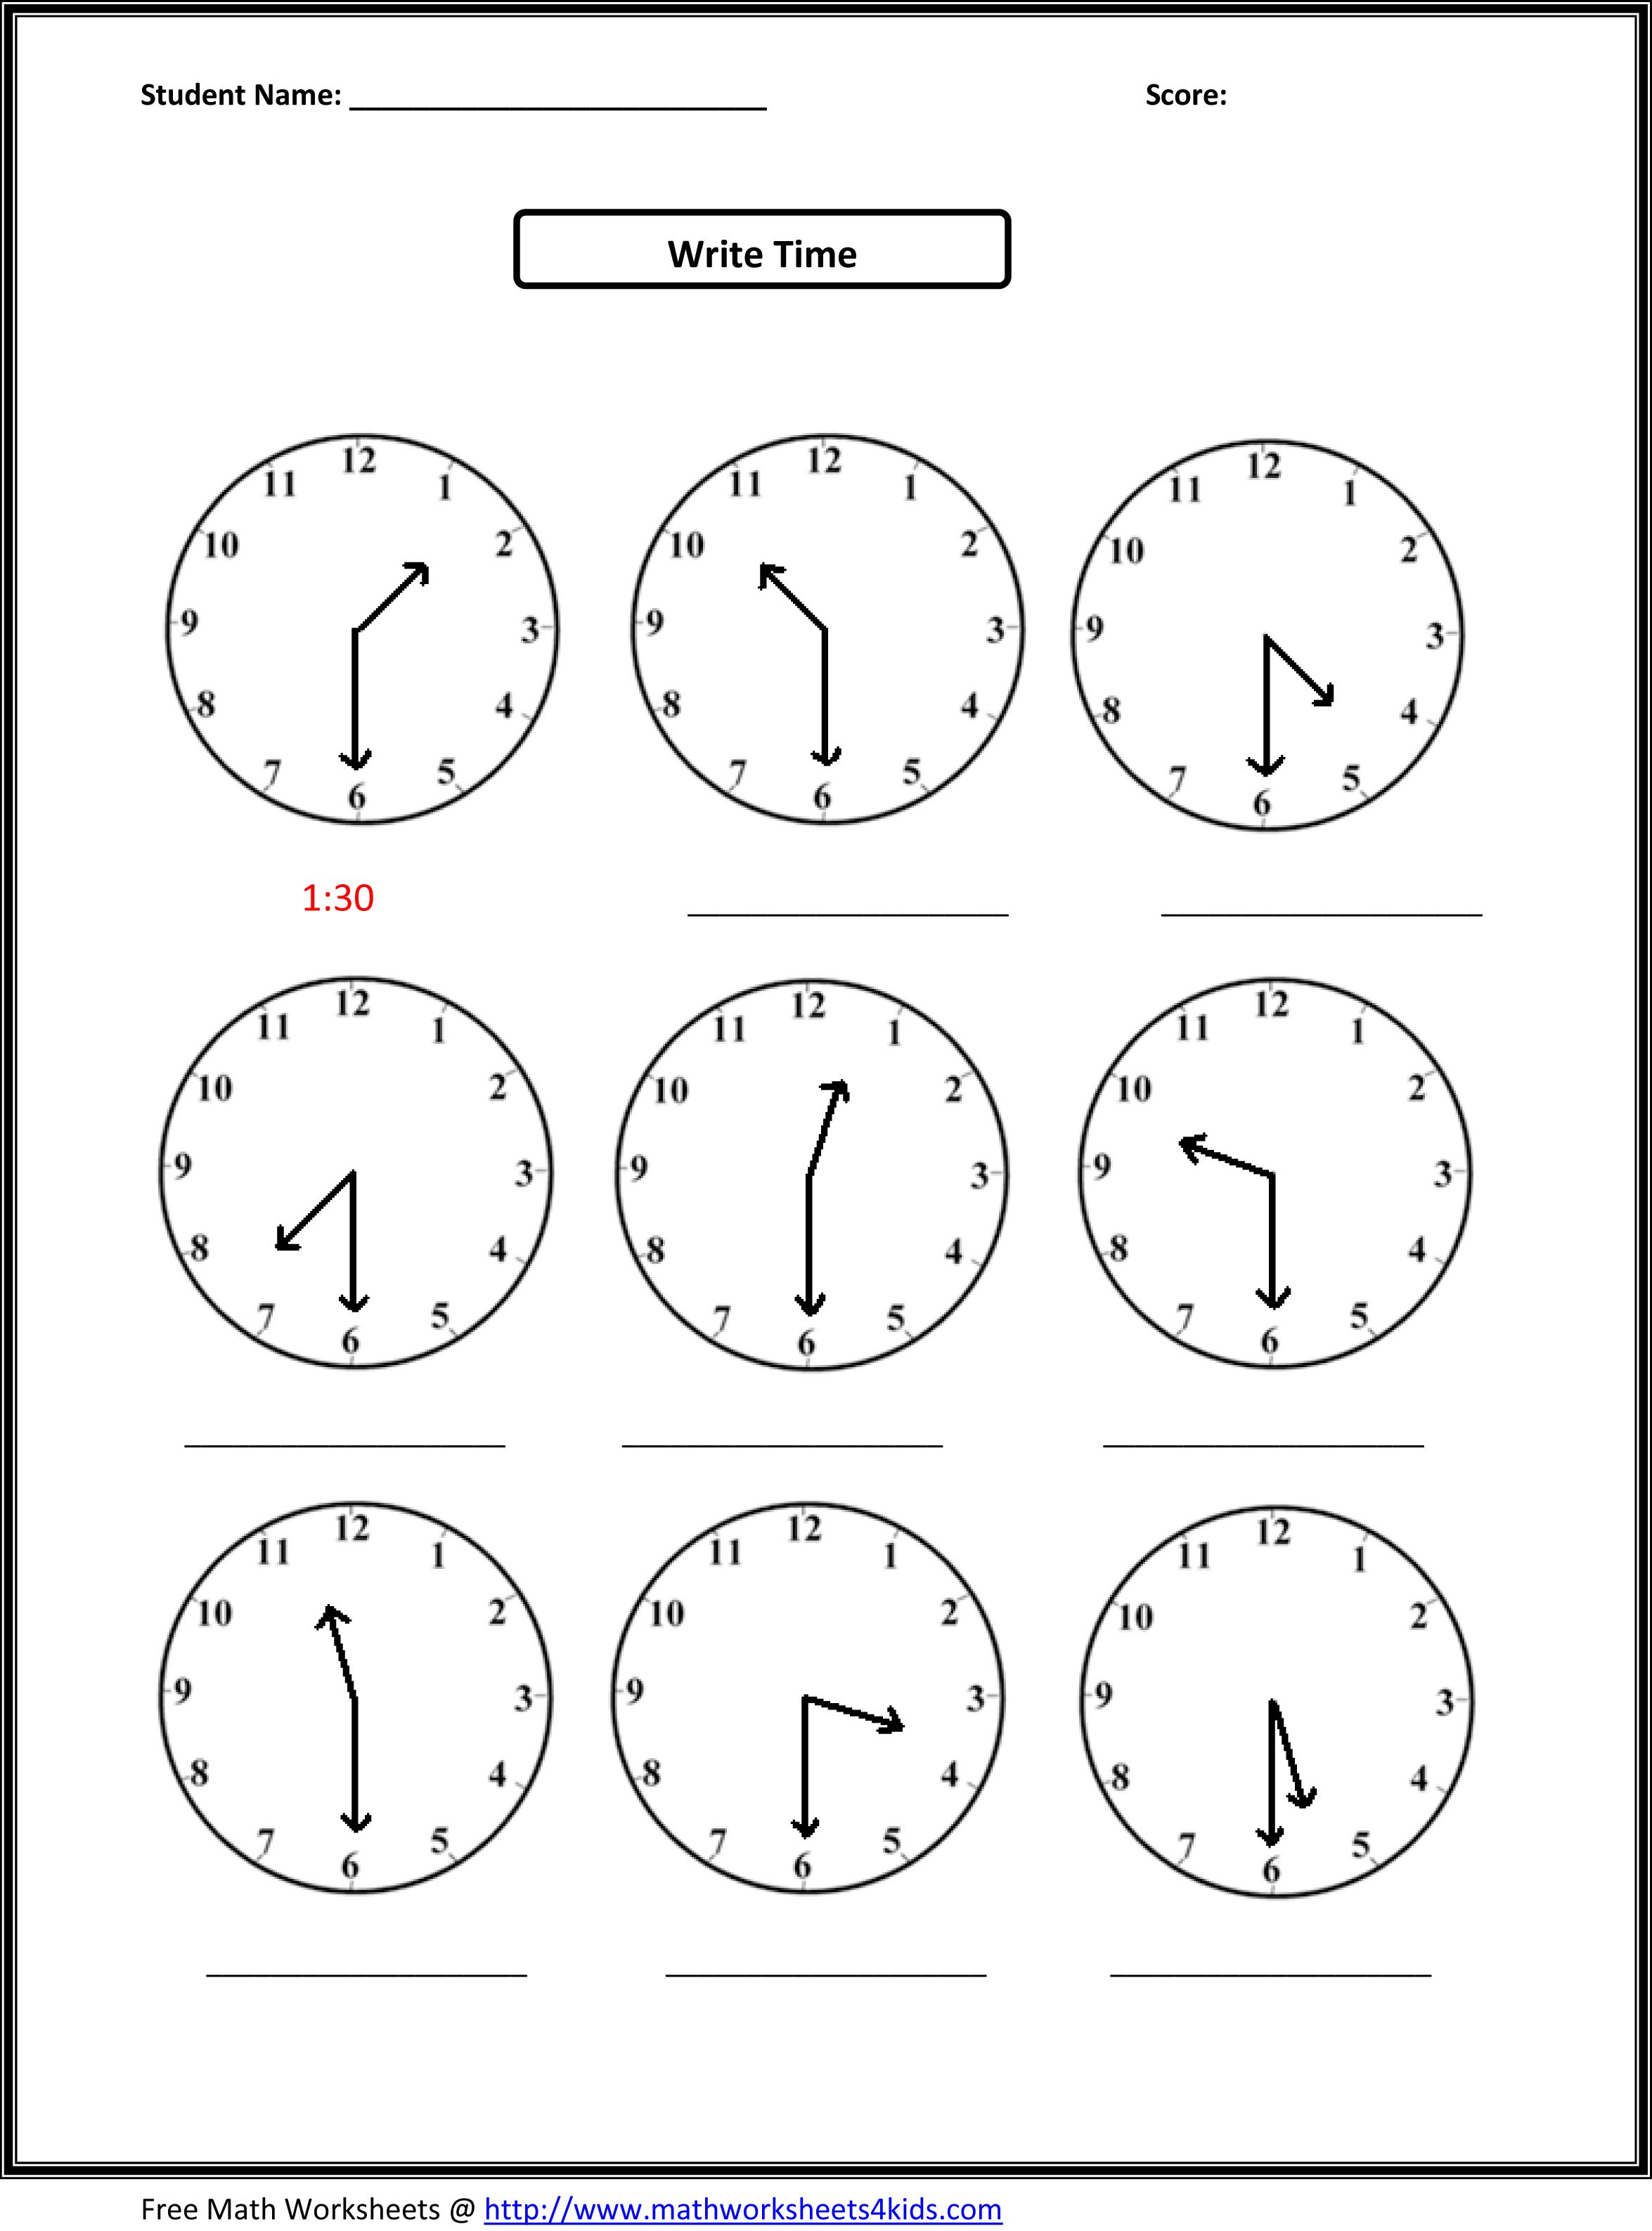 16 Best Images Of 3rd Grade Multiplication Properties